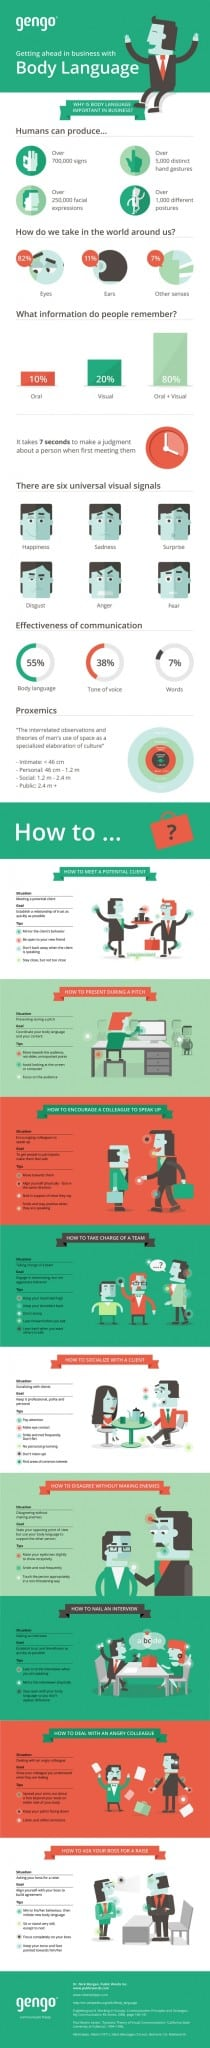 Body-Language-Infographic-620x6059